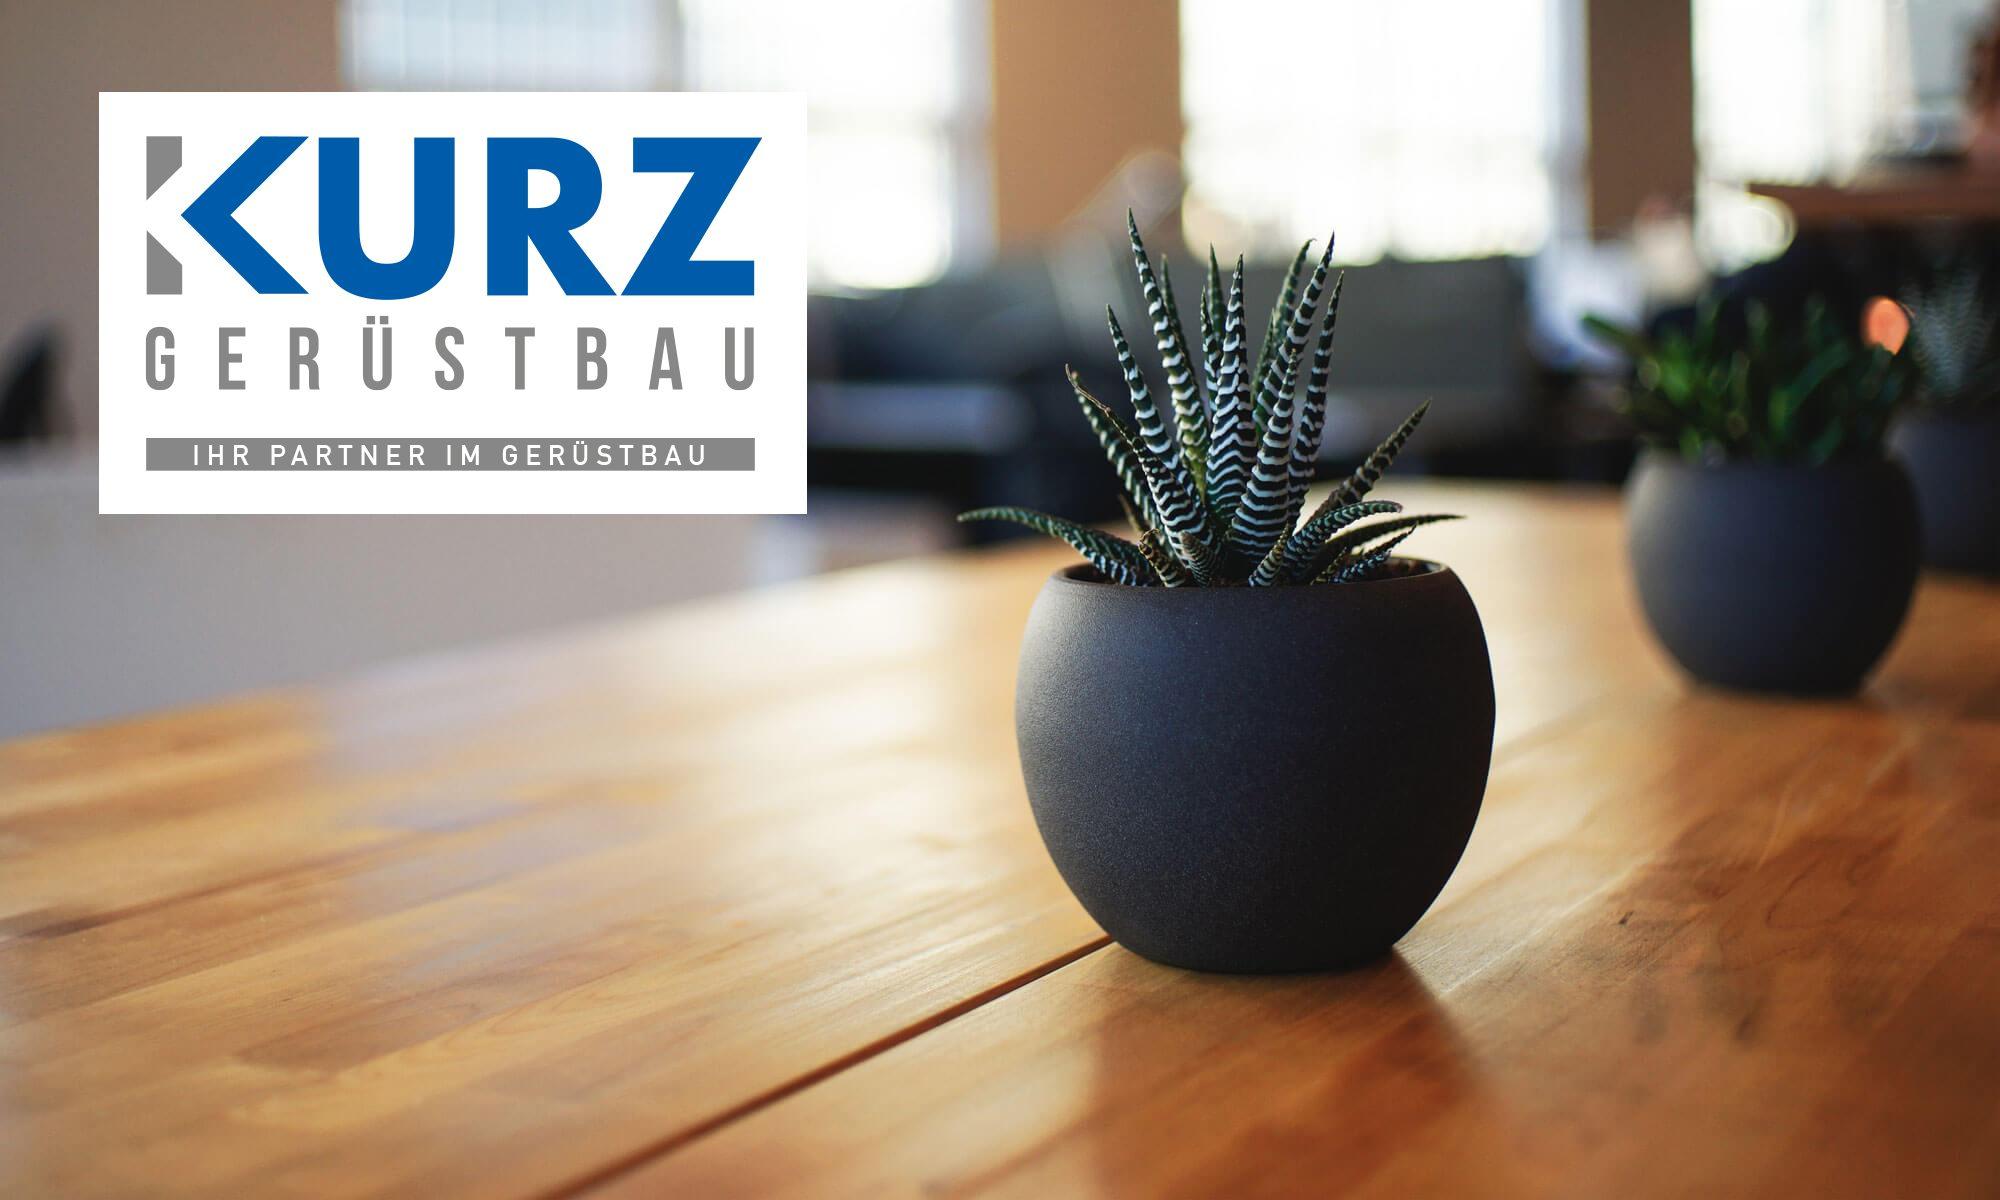 Kurz Gerüstbau GmbH